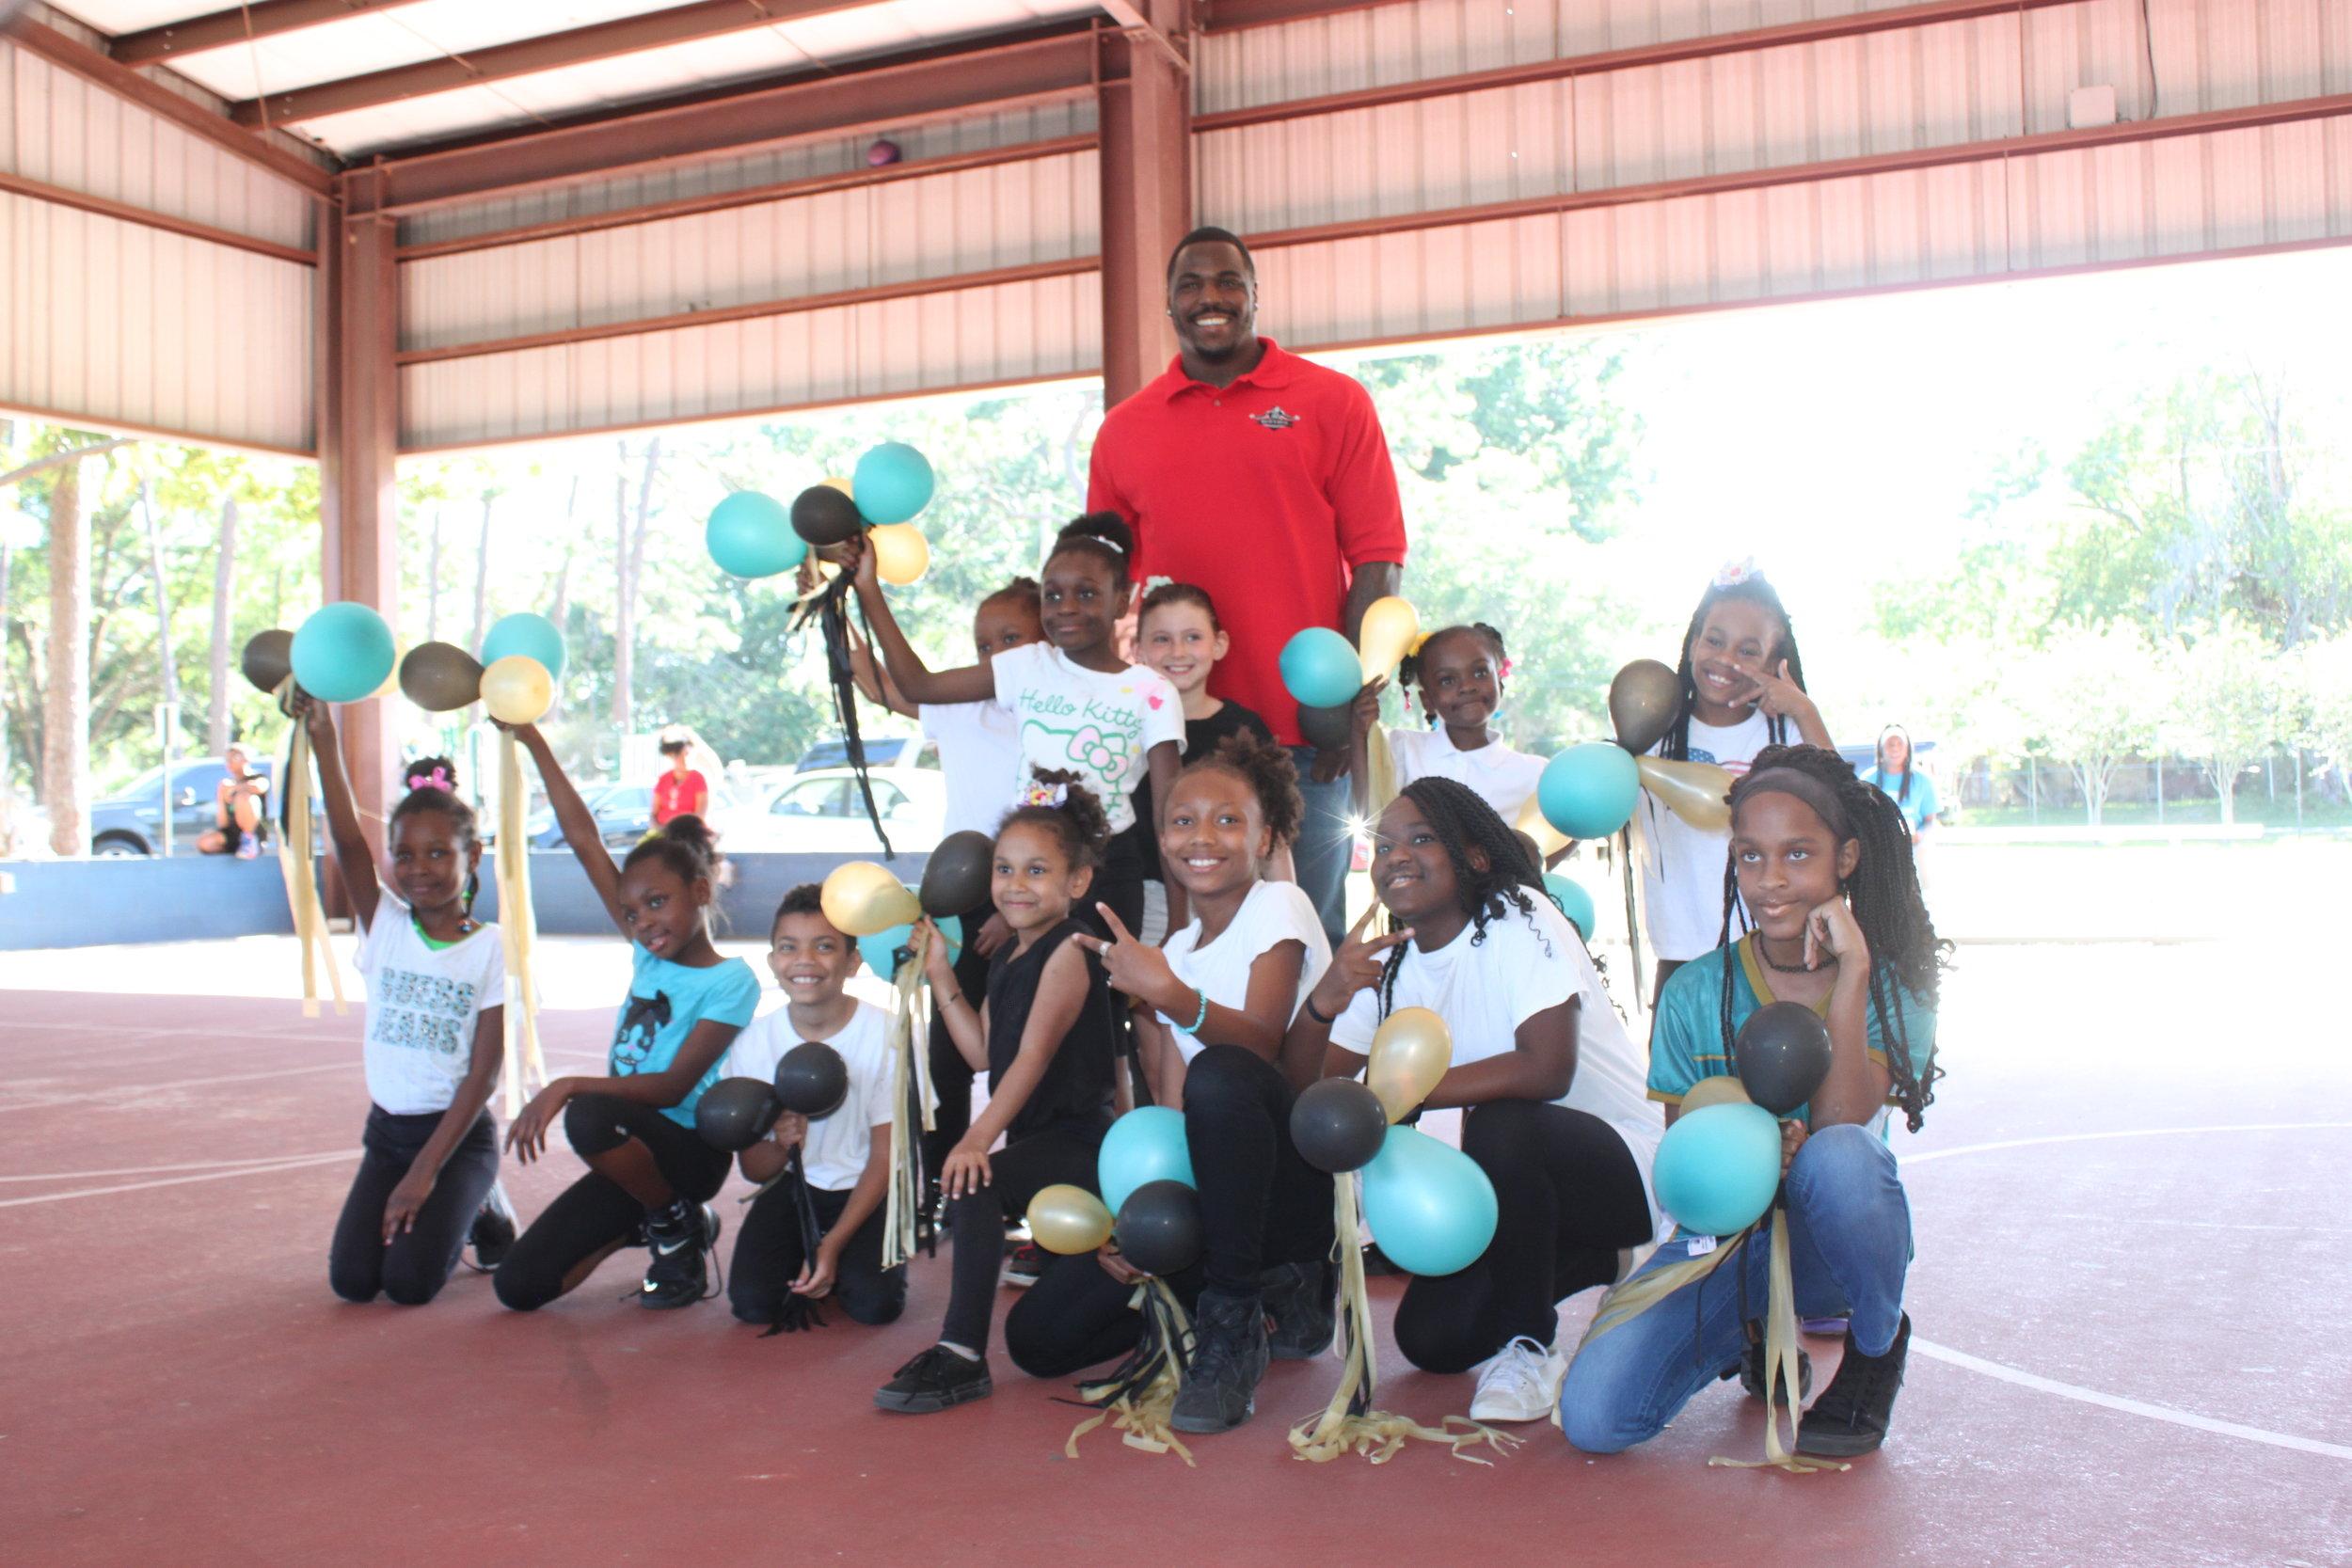 2017: Malik Jackson, DT of Jacksonville Jaguars Visits Woodland Acres Boys & Girls Club